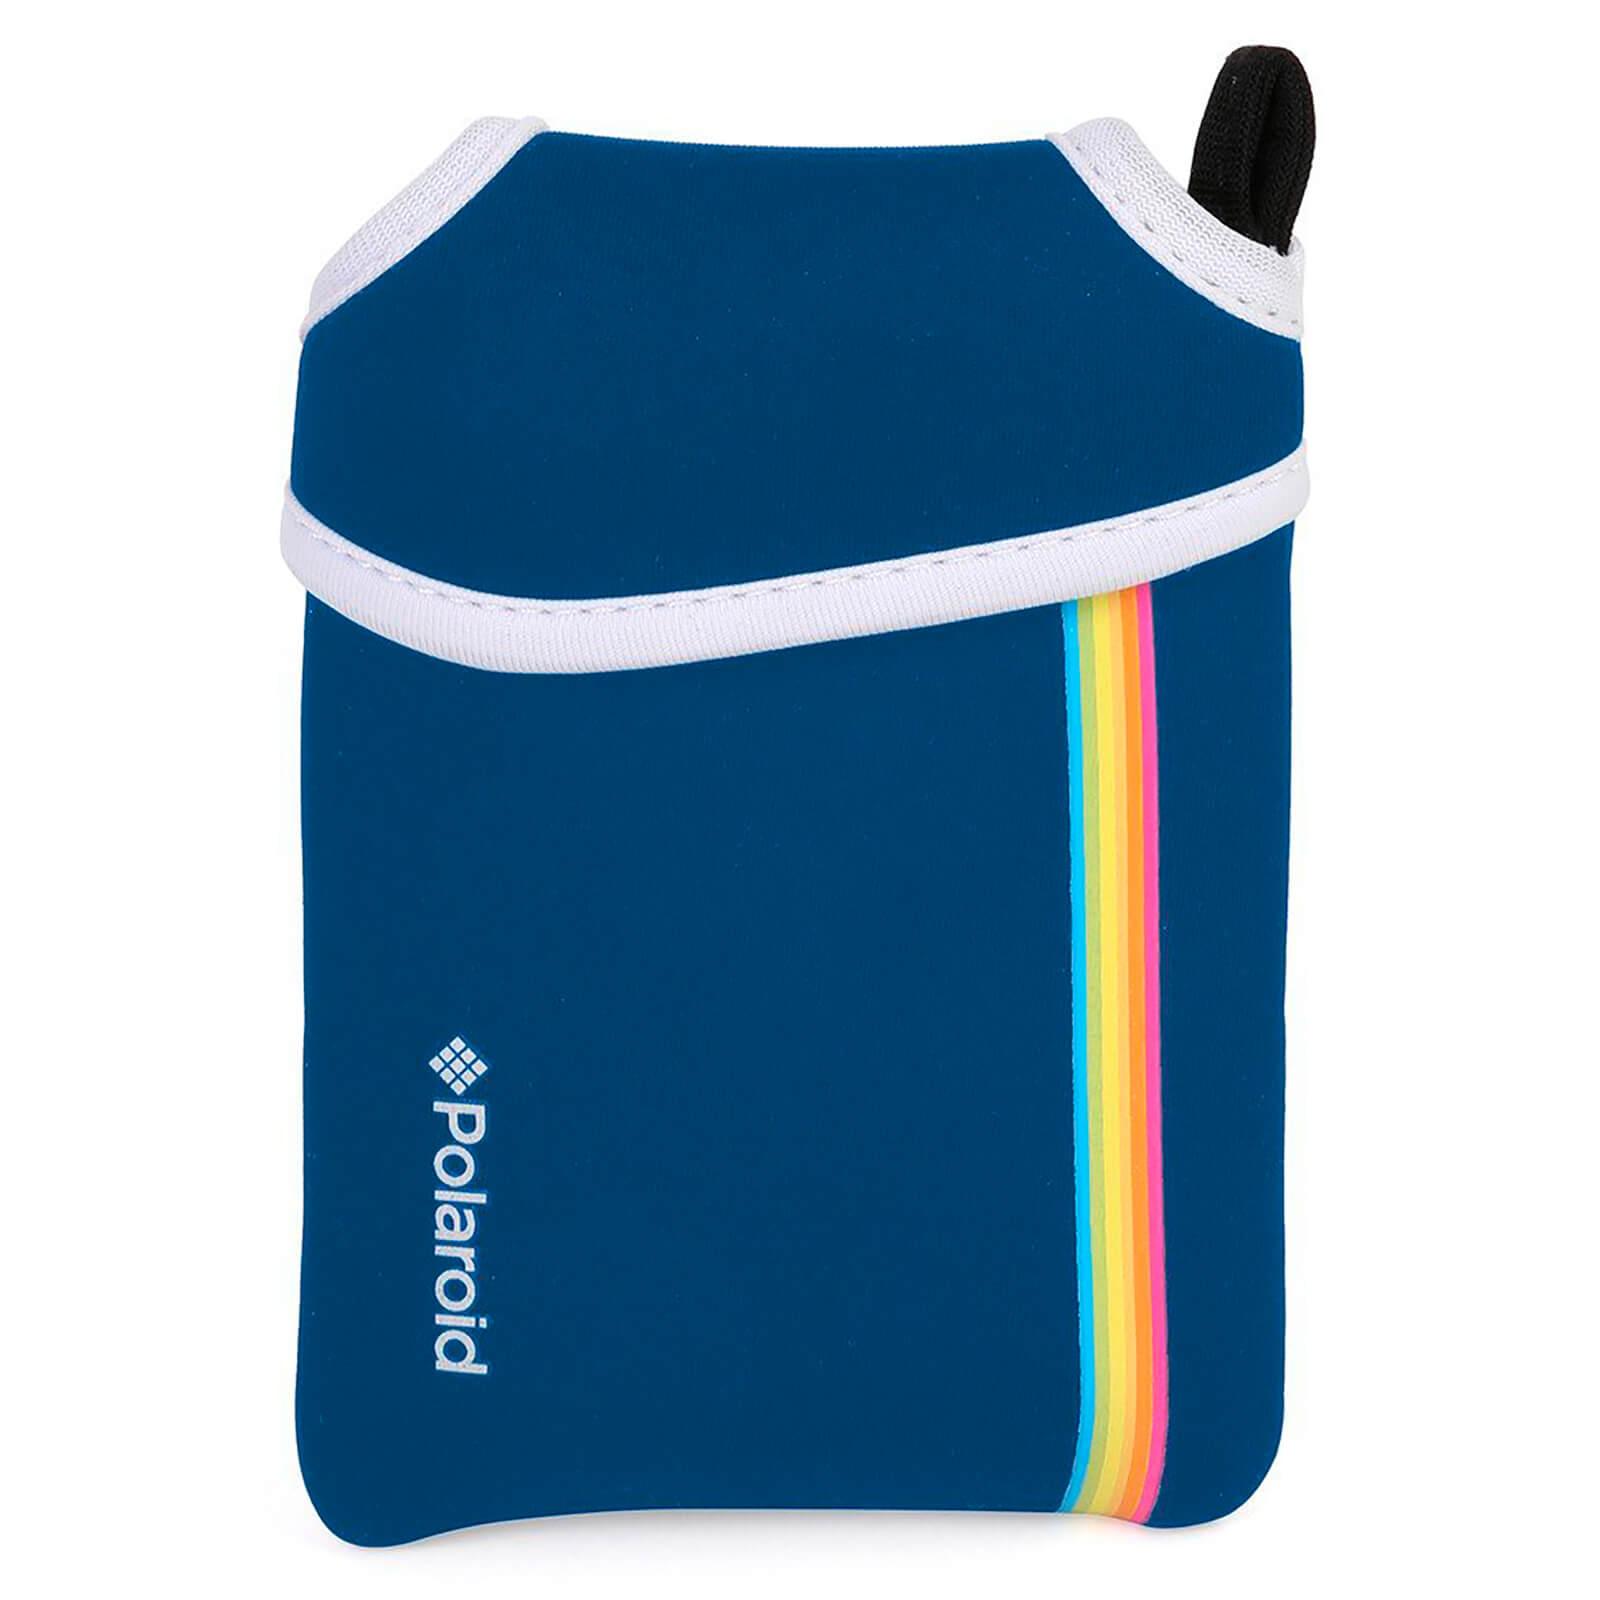 Polaroid Neoprene Pouch (For Snap Instant Digital Print Camera) - Blue